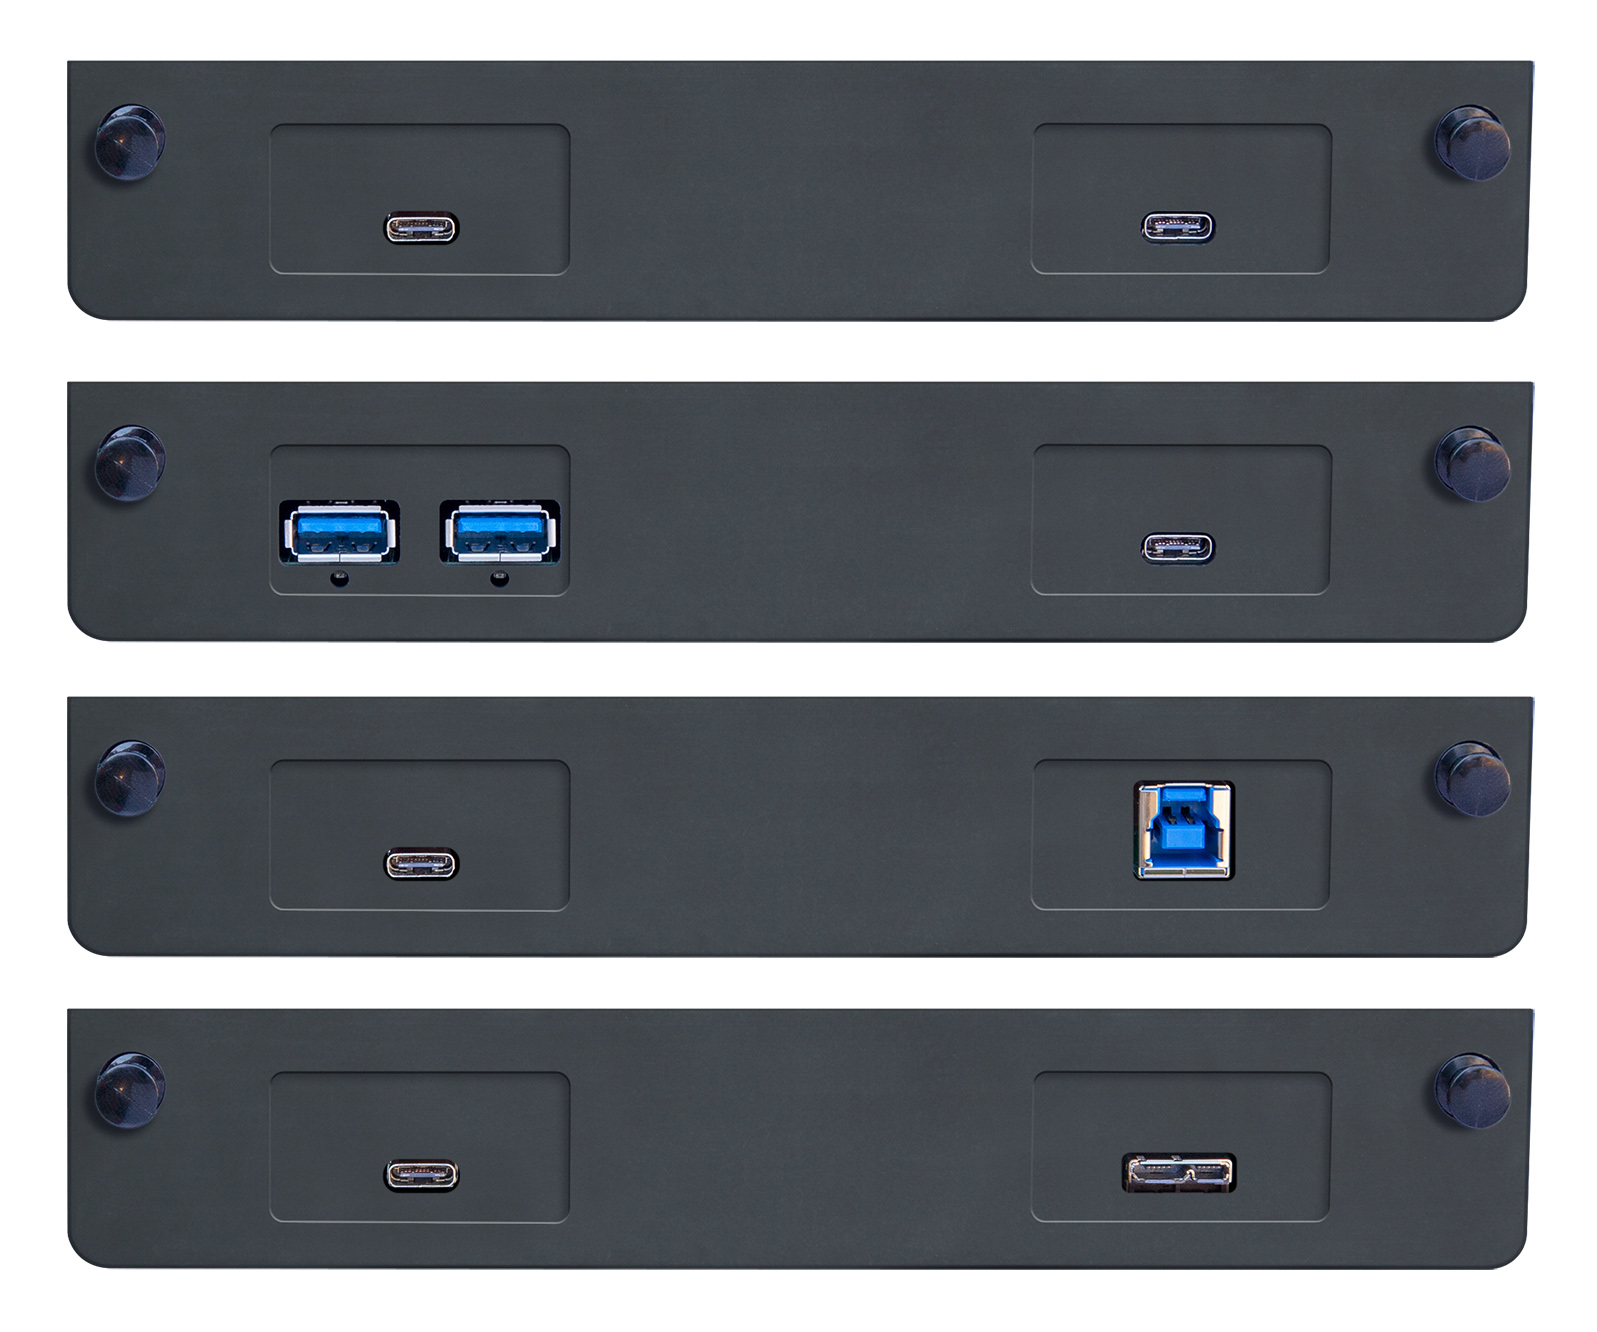 Advanced Cable Tester v2 Type-C Bundle